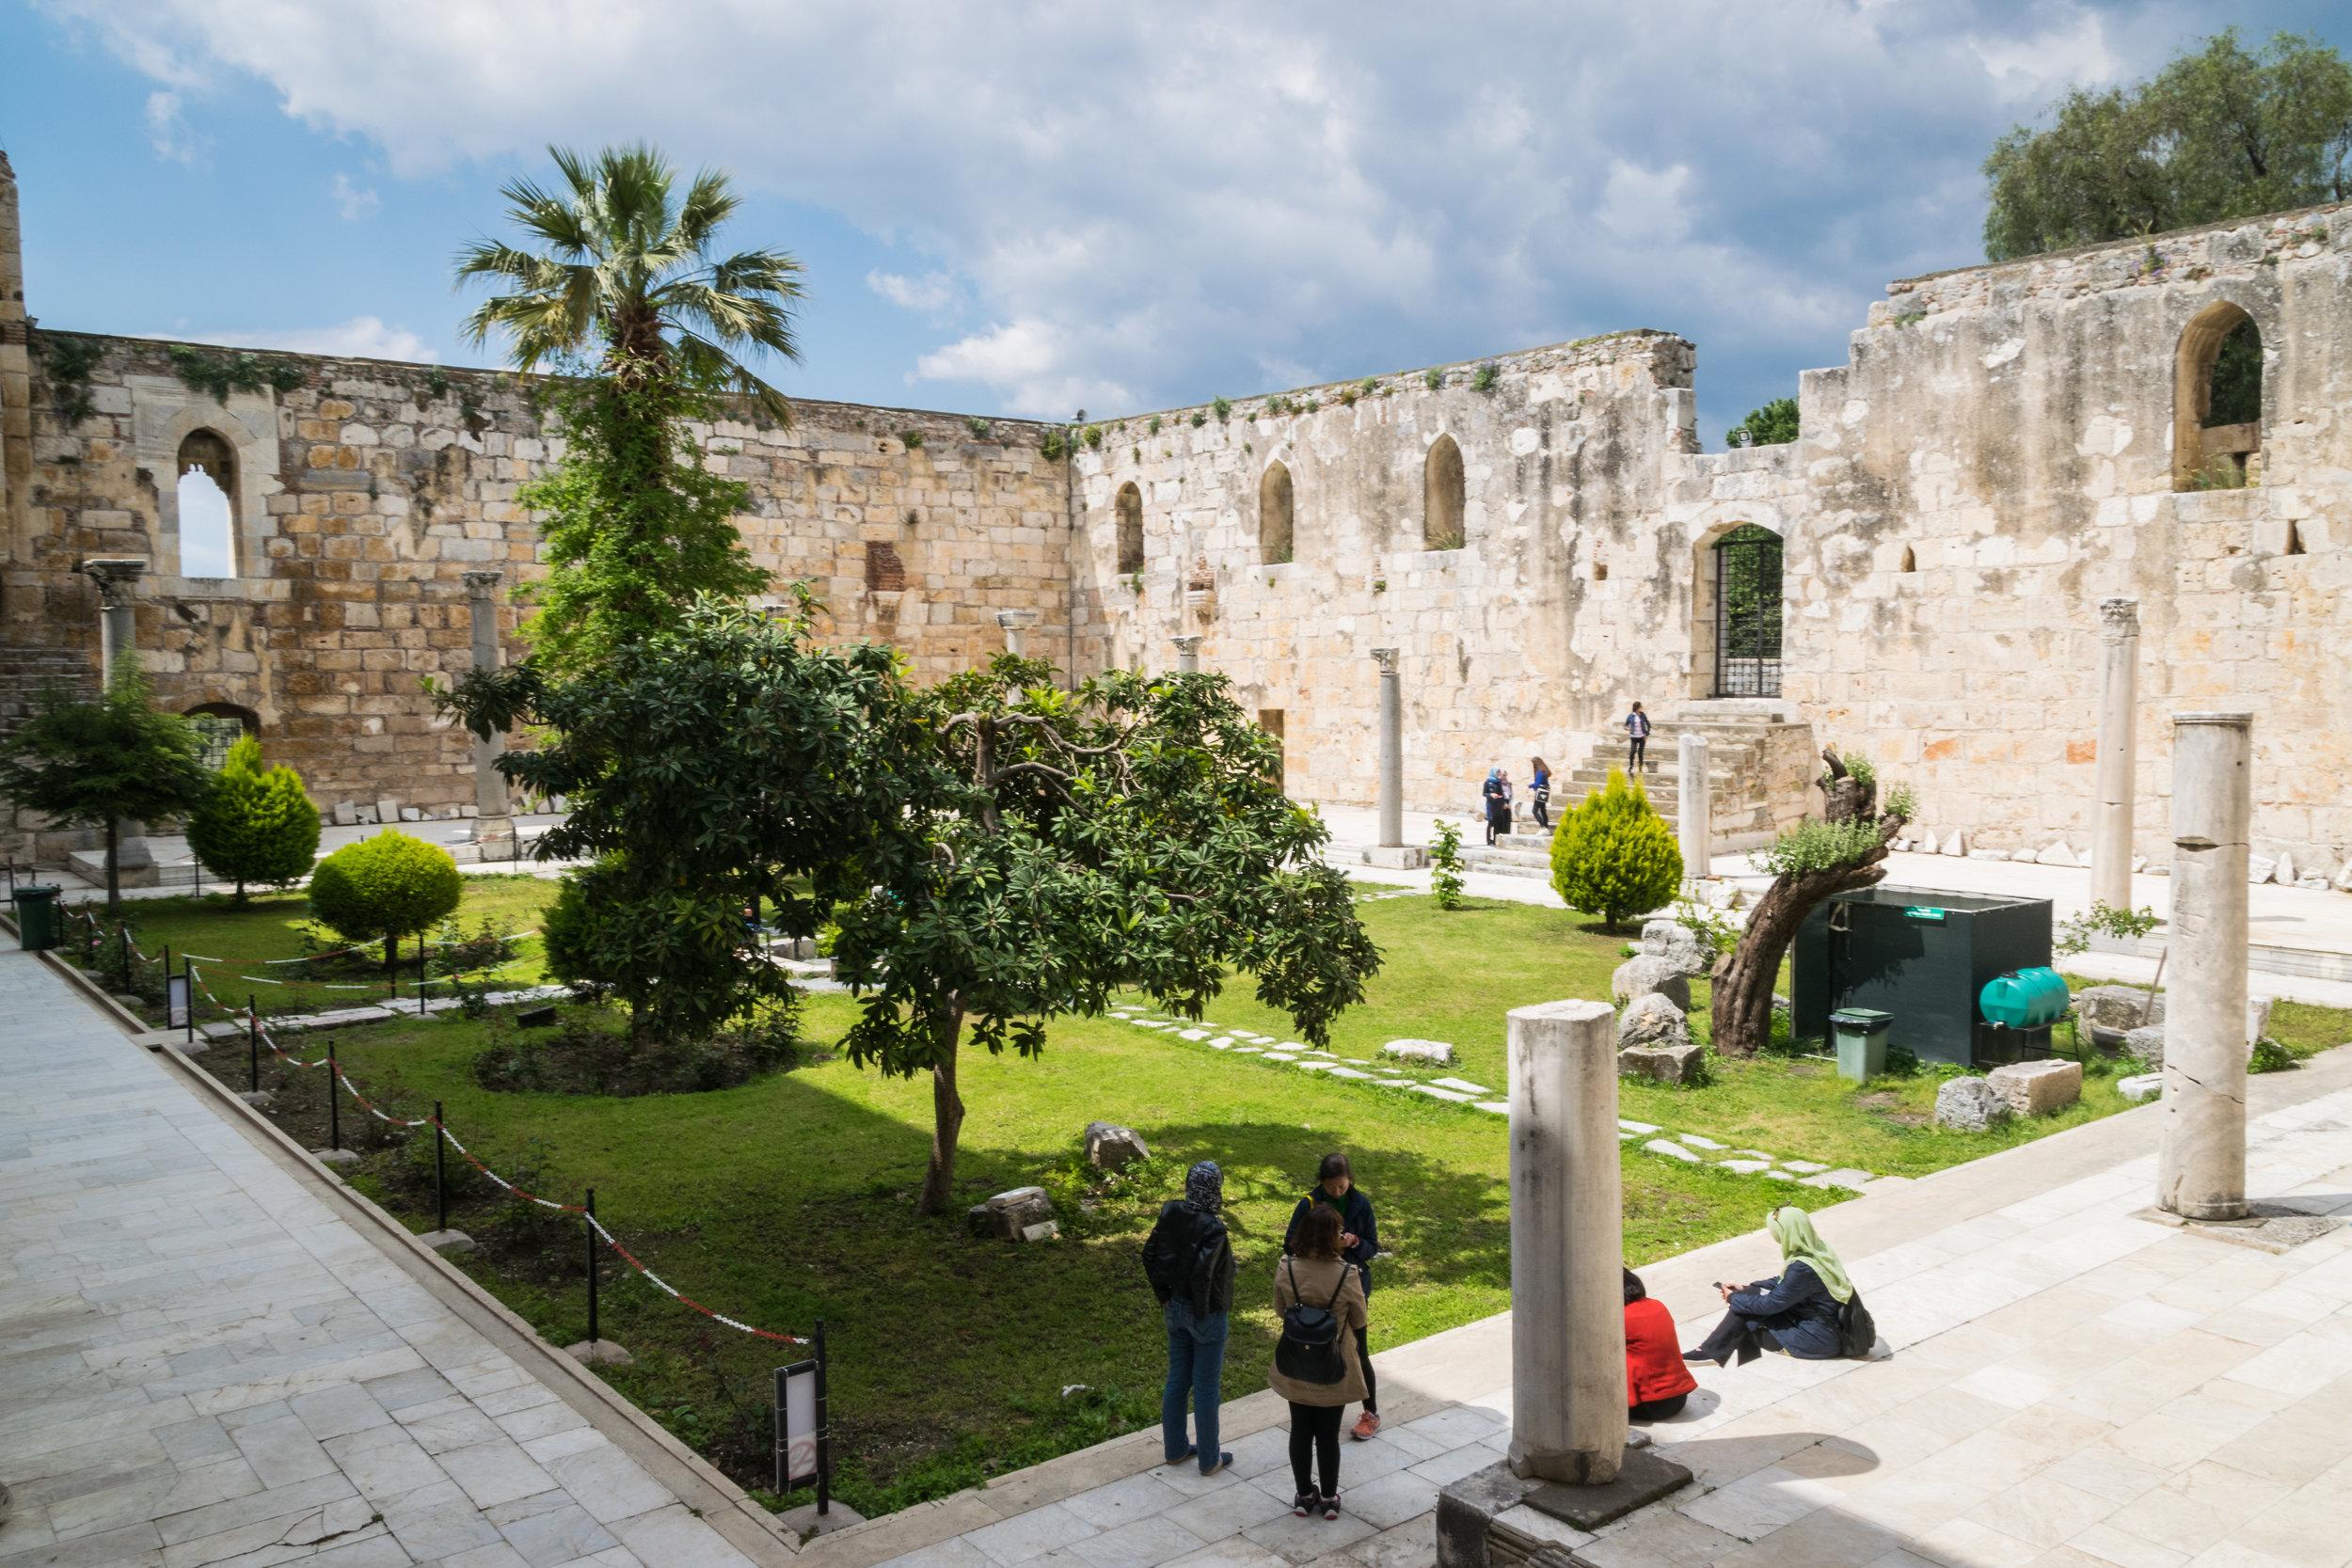 Isa Bey Mosque courtyard